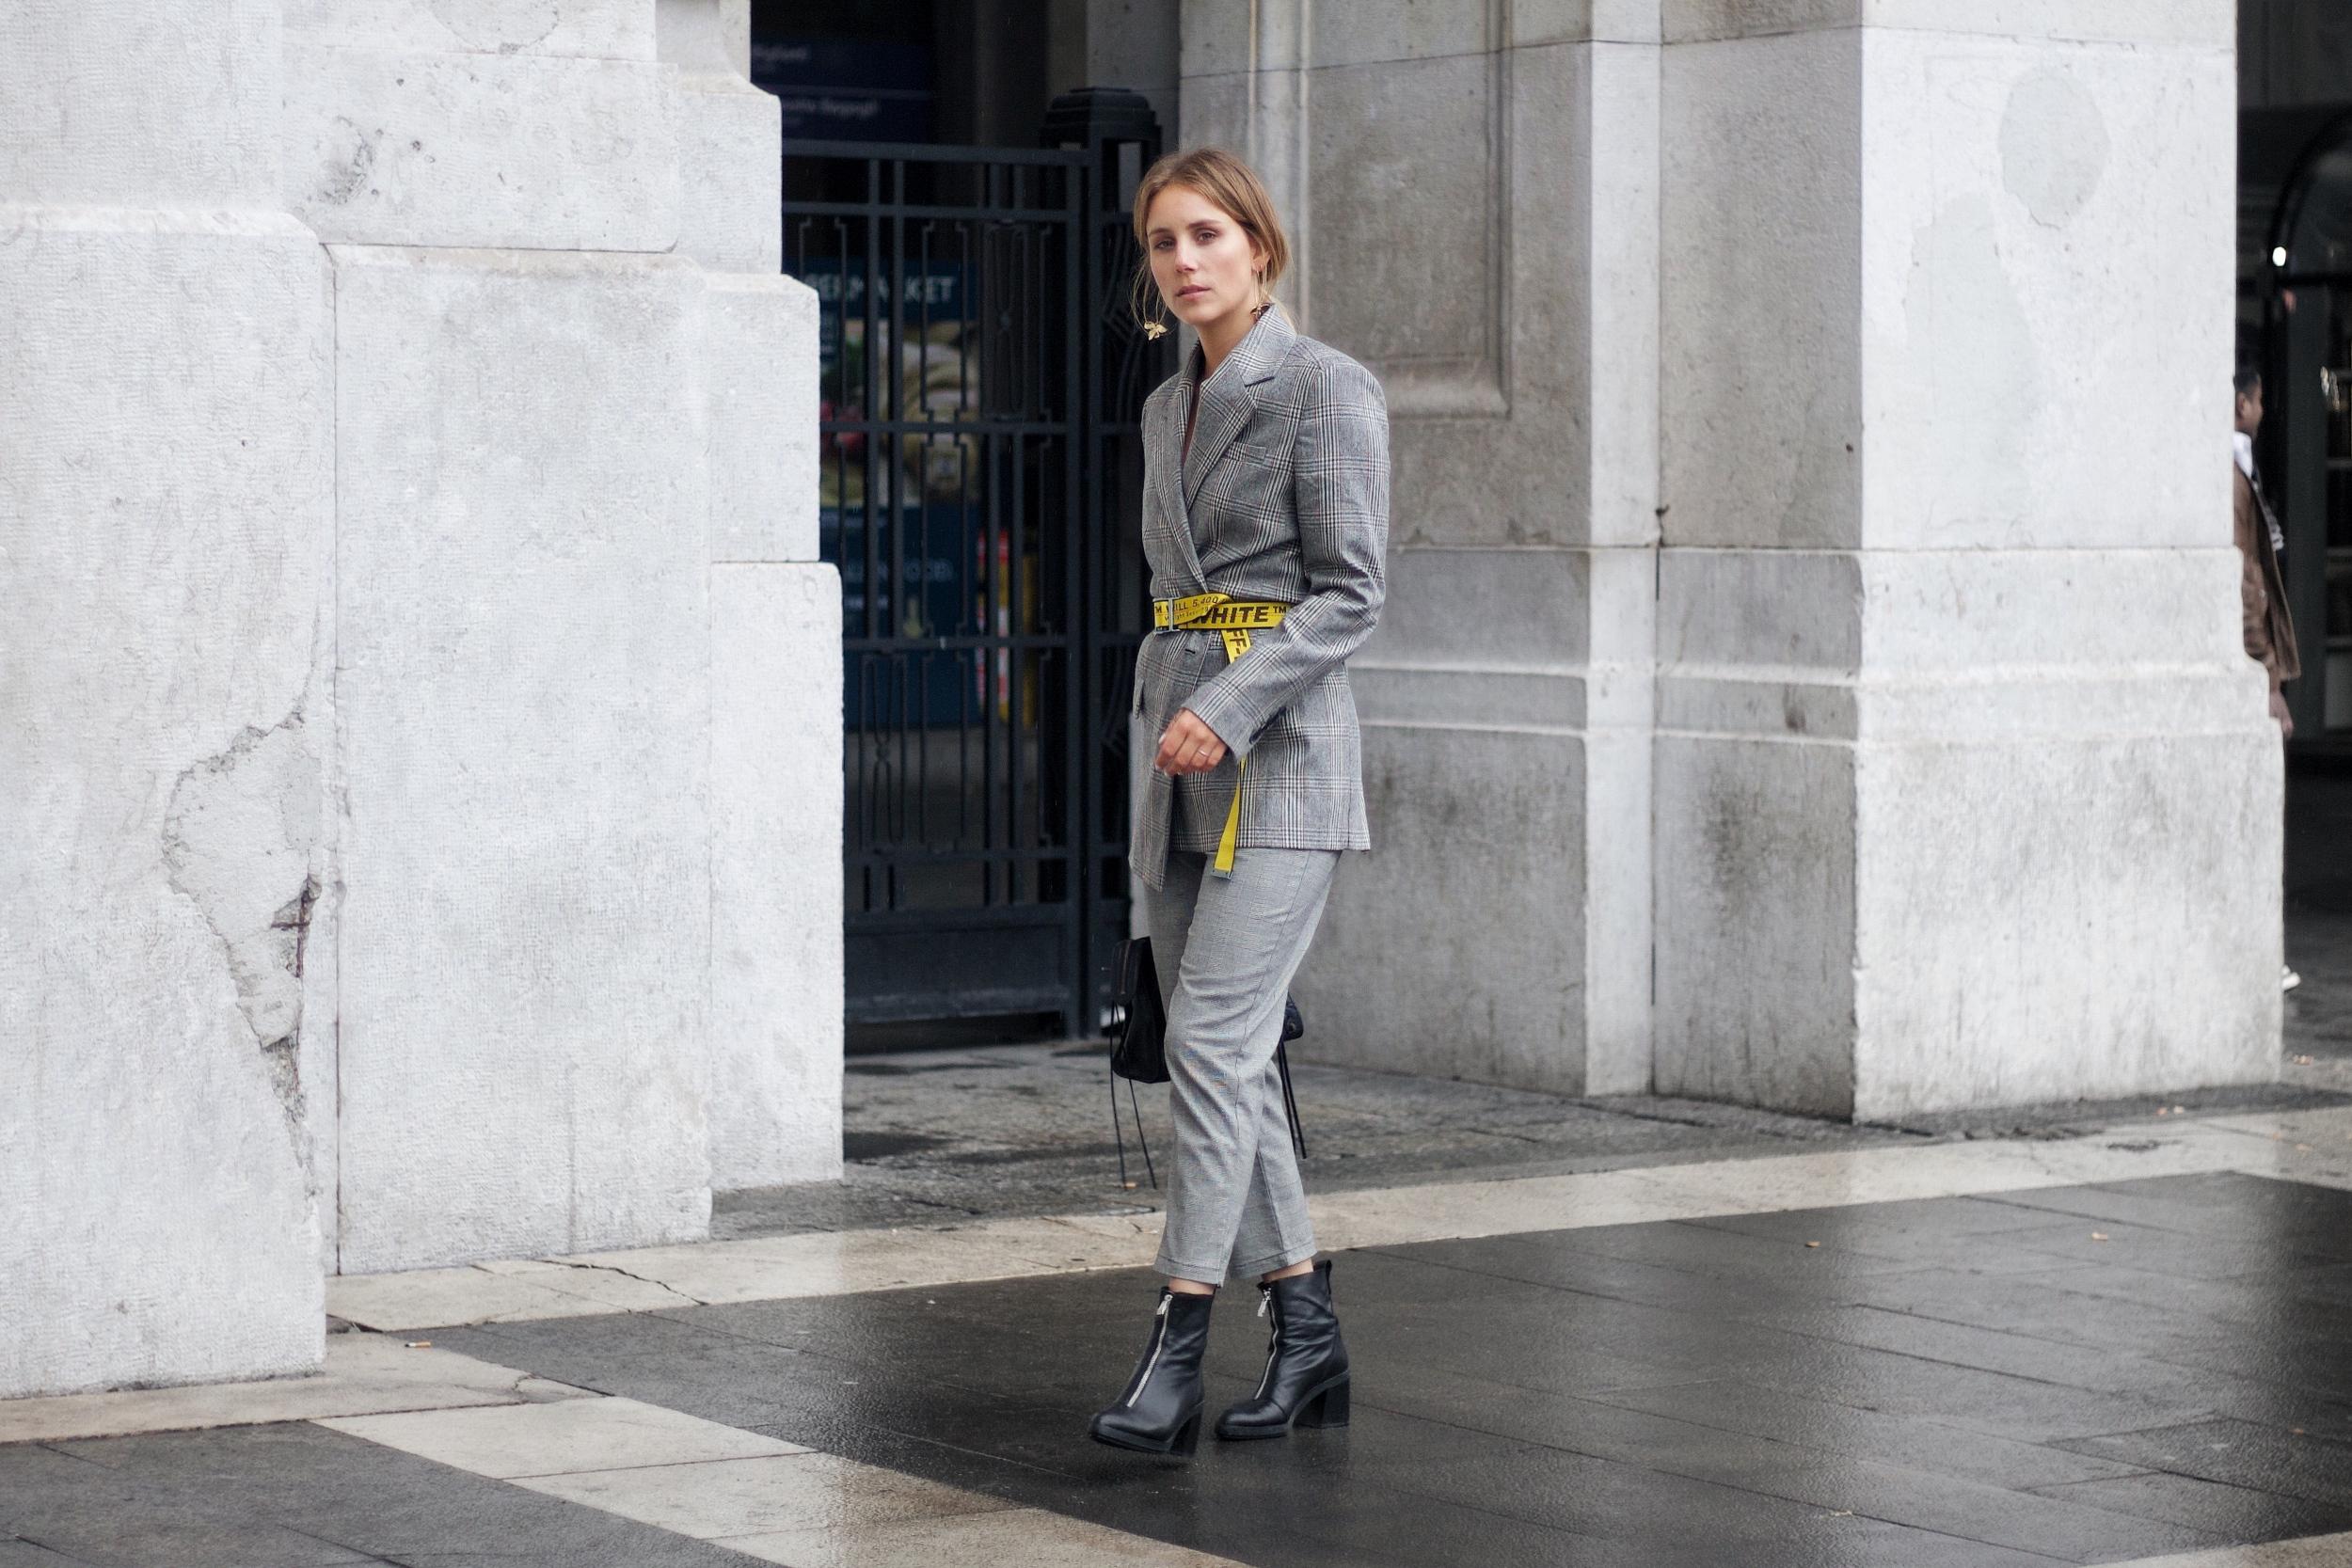 Oversized Blazer, Off-White Gürtel: How to style your boyfriends clothes